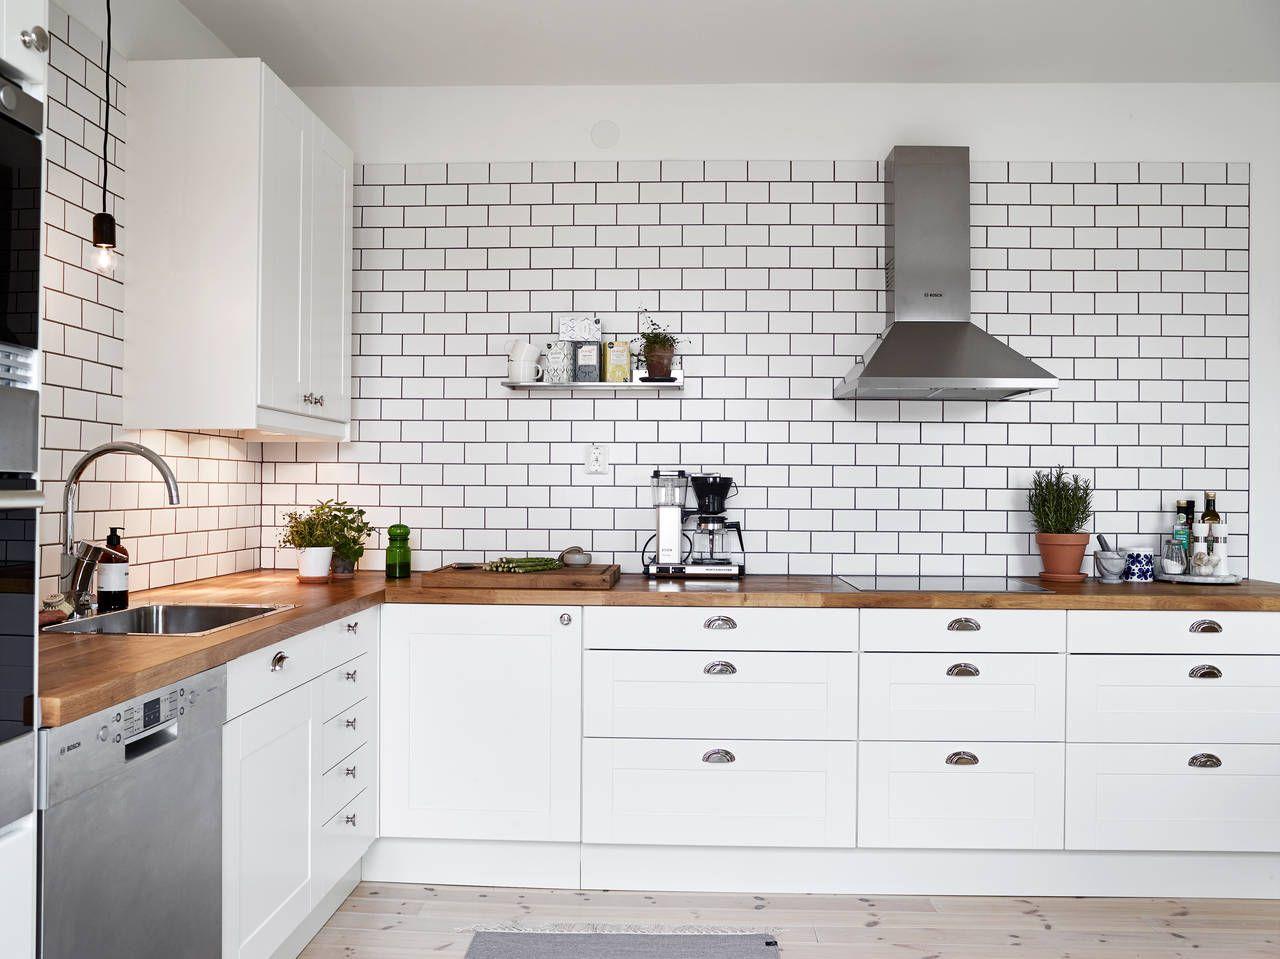 Retile your kitchen